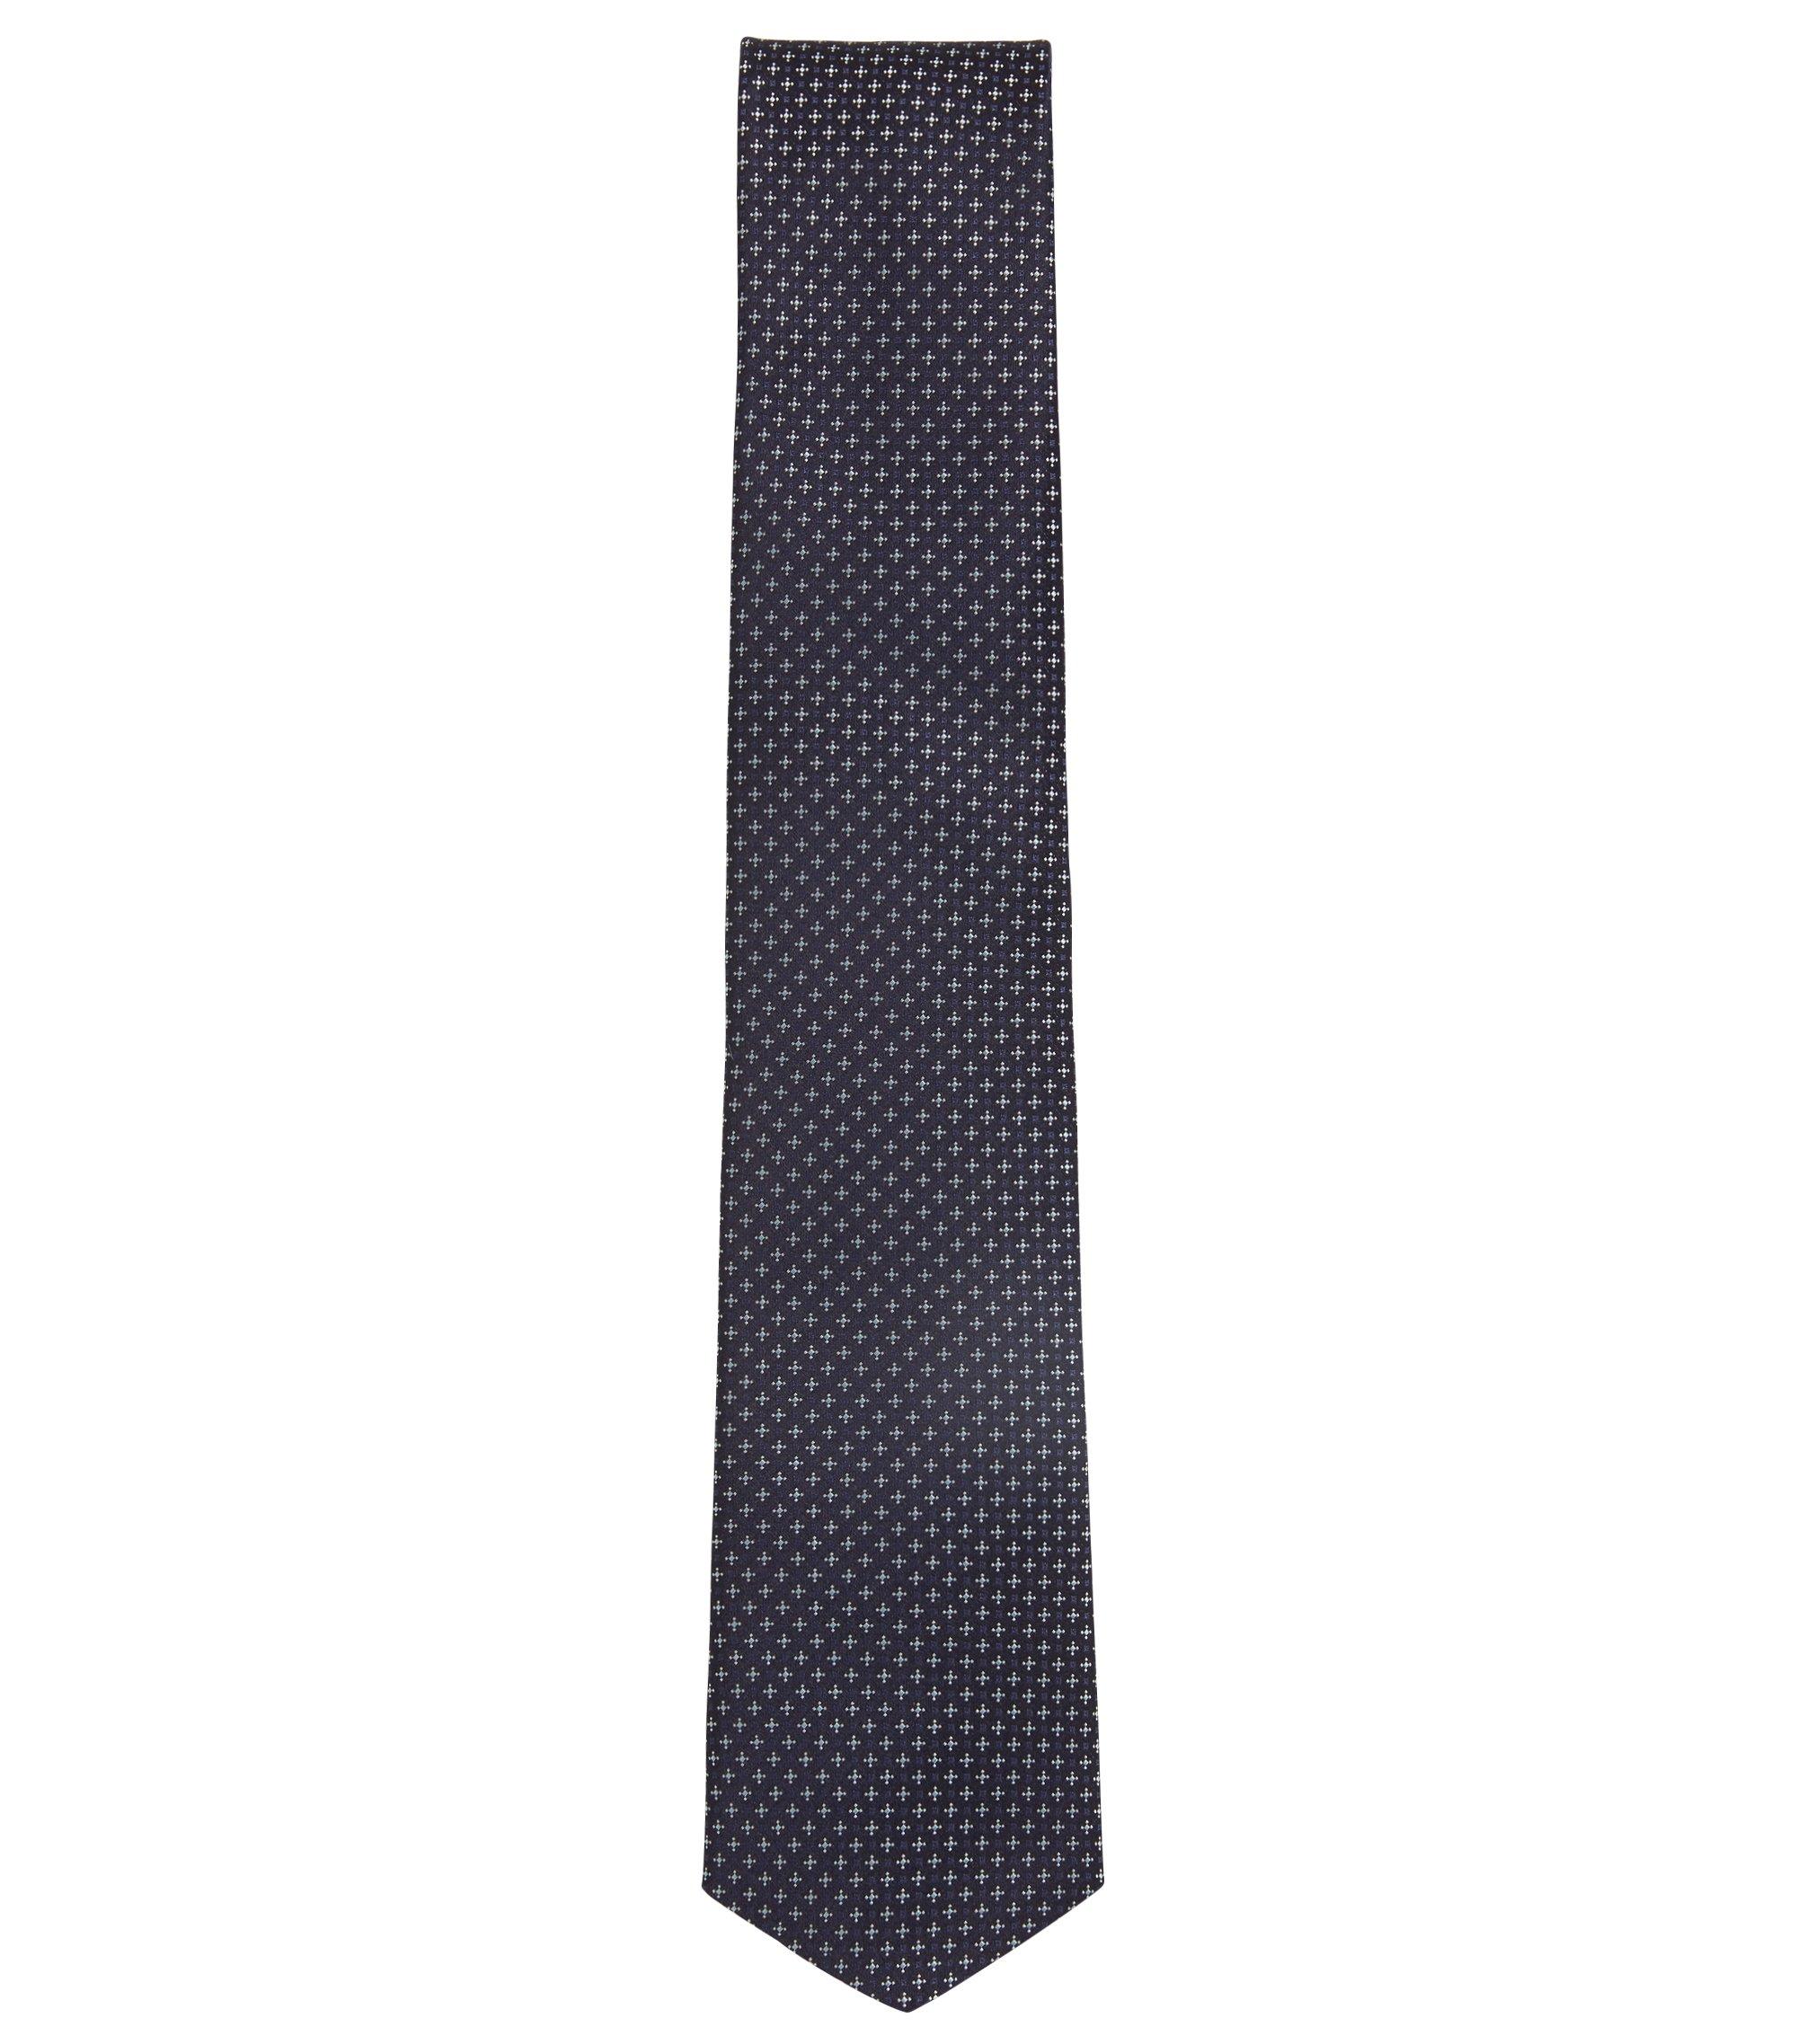 Corbata estampada elaborada en Italia con seda repelente al agua, Celeste